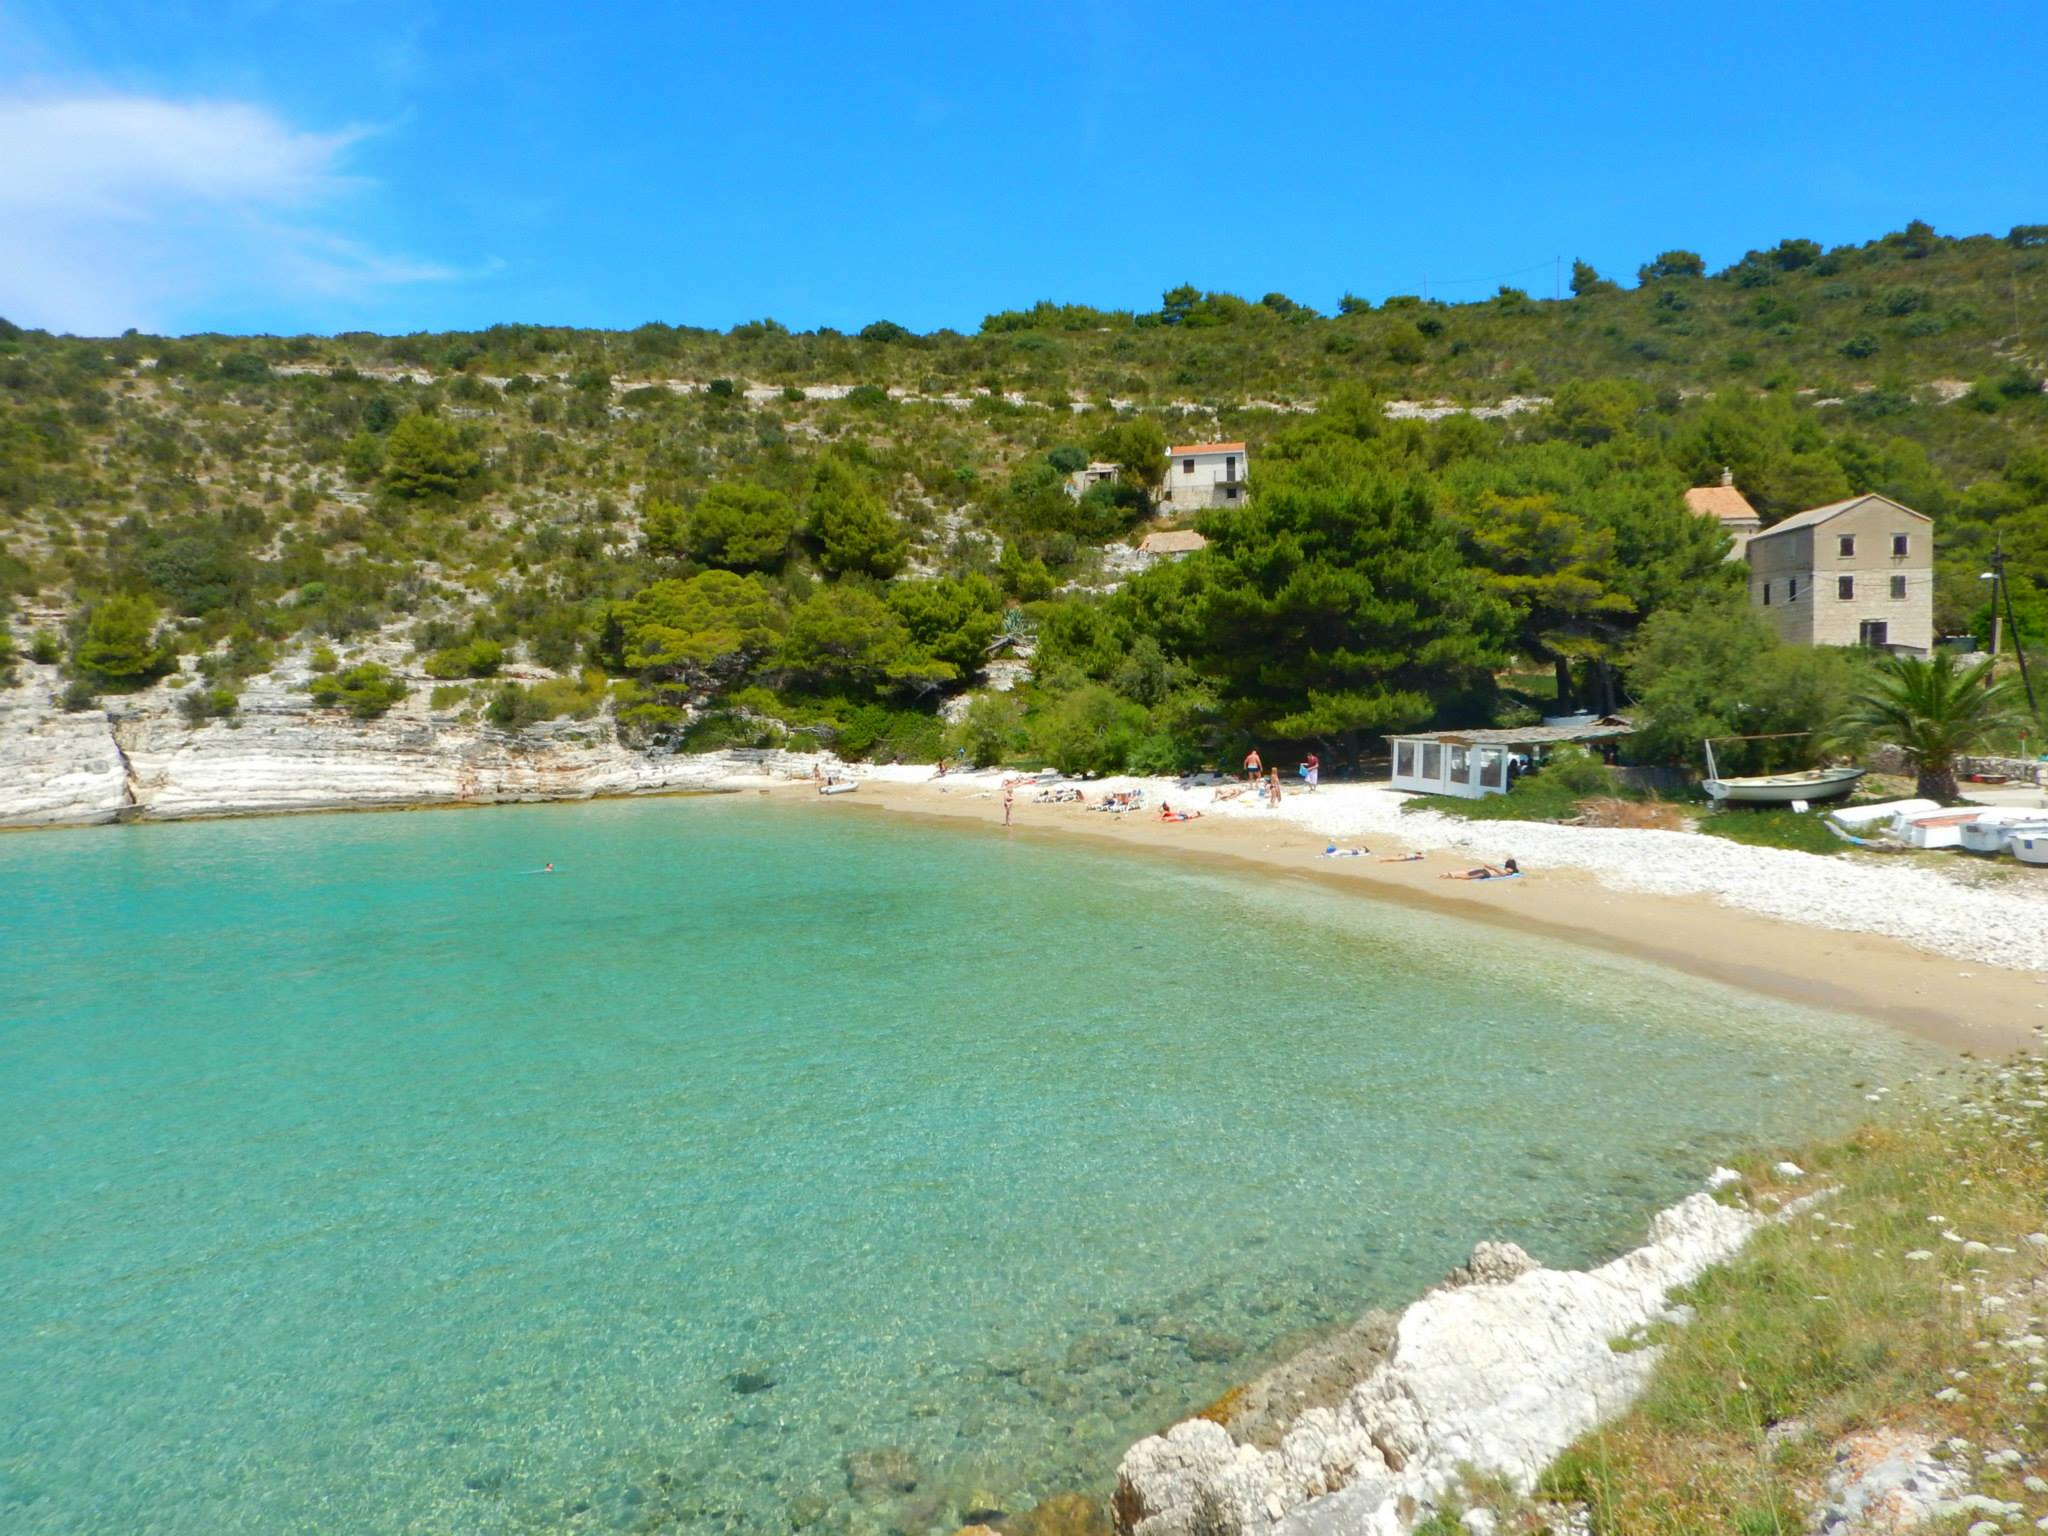 Adriatic Island Adventures – Hvar, Vis & Biševo